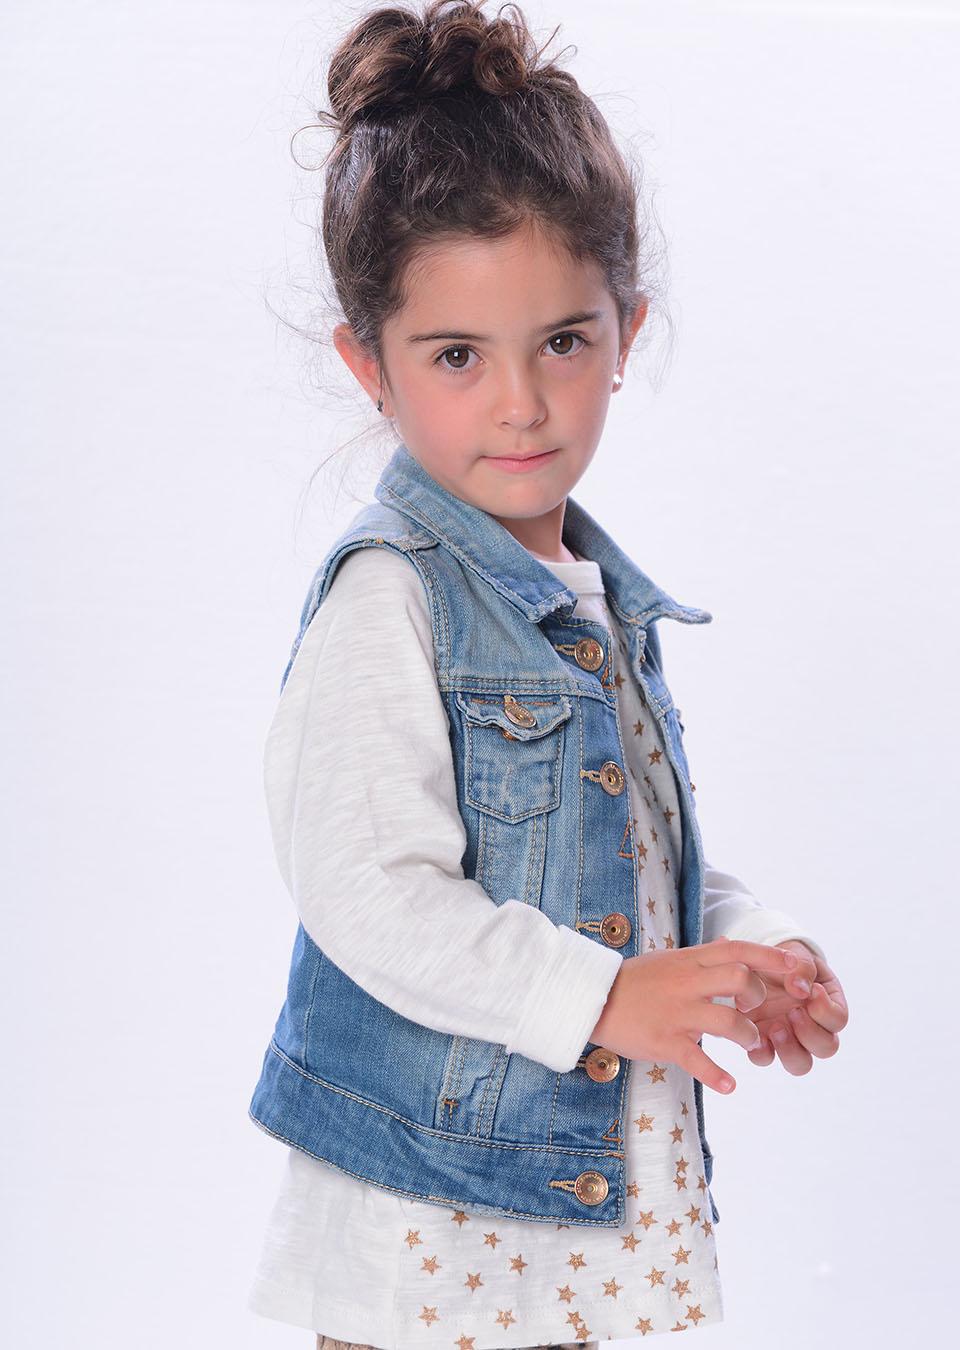 amalia aristizabal (4)